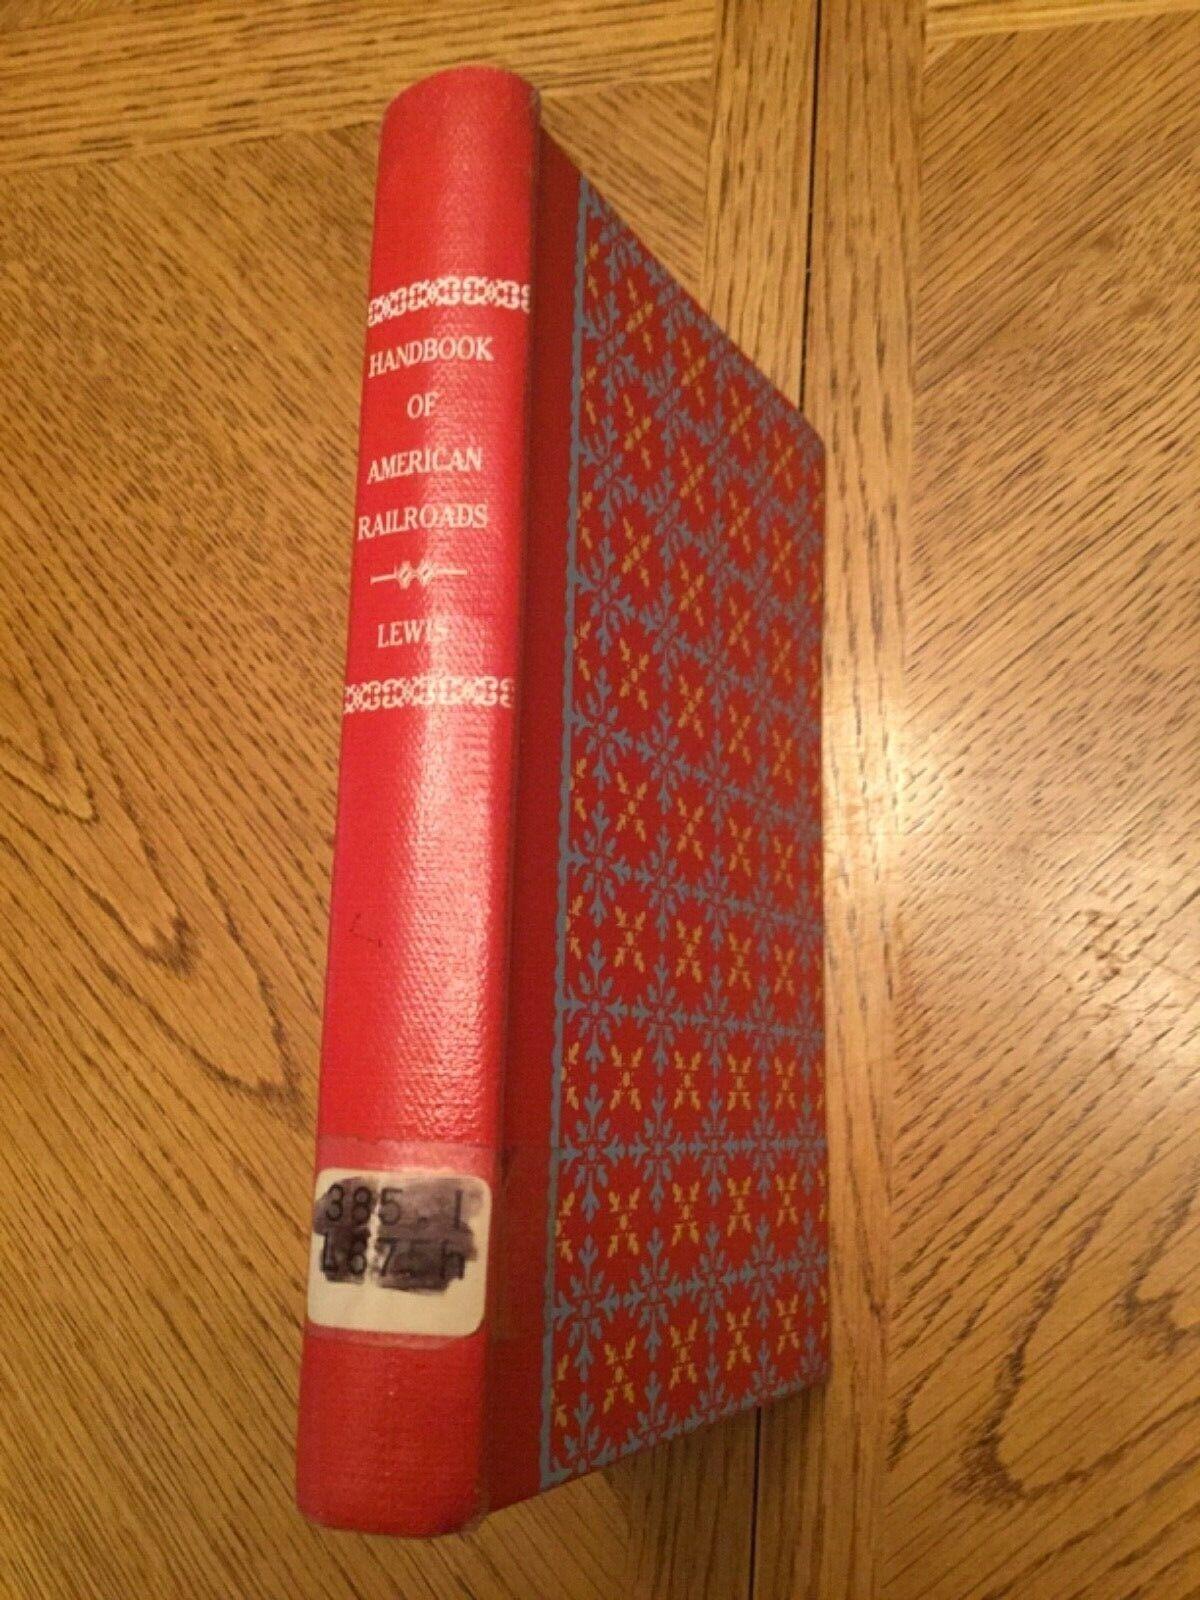 Handbook  of American Railroads by Robert G. Lewis, 1st Ed. 1951